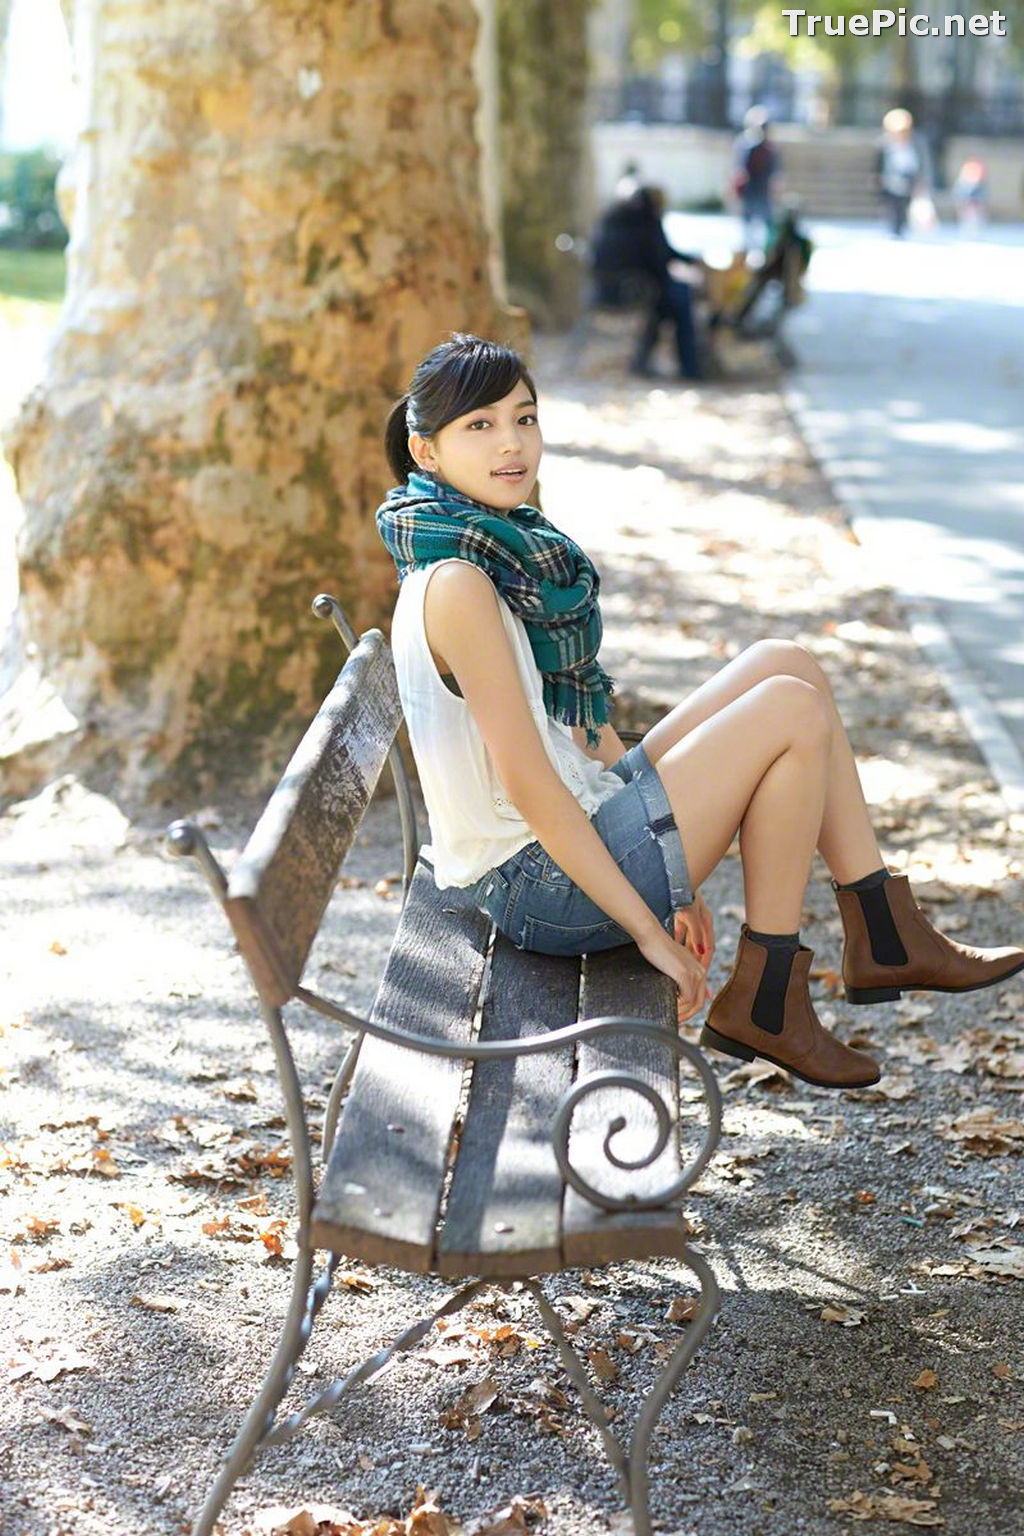 Image Wanibooks No.132 - Japanese Actress and Gravure Idol - Haruna Kawaguchi - TruePic.net - Picture-2